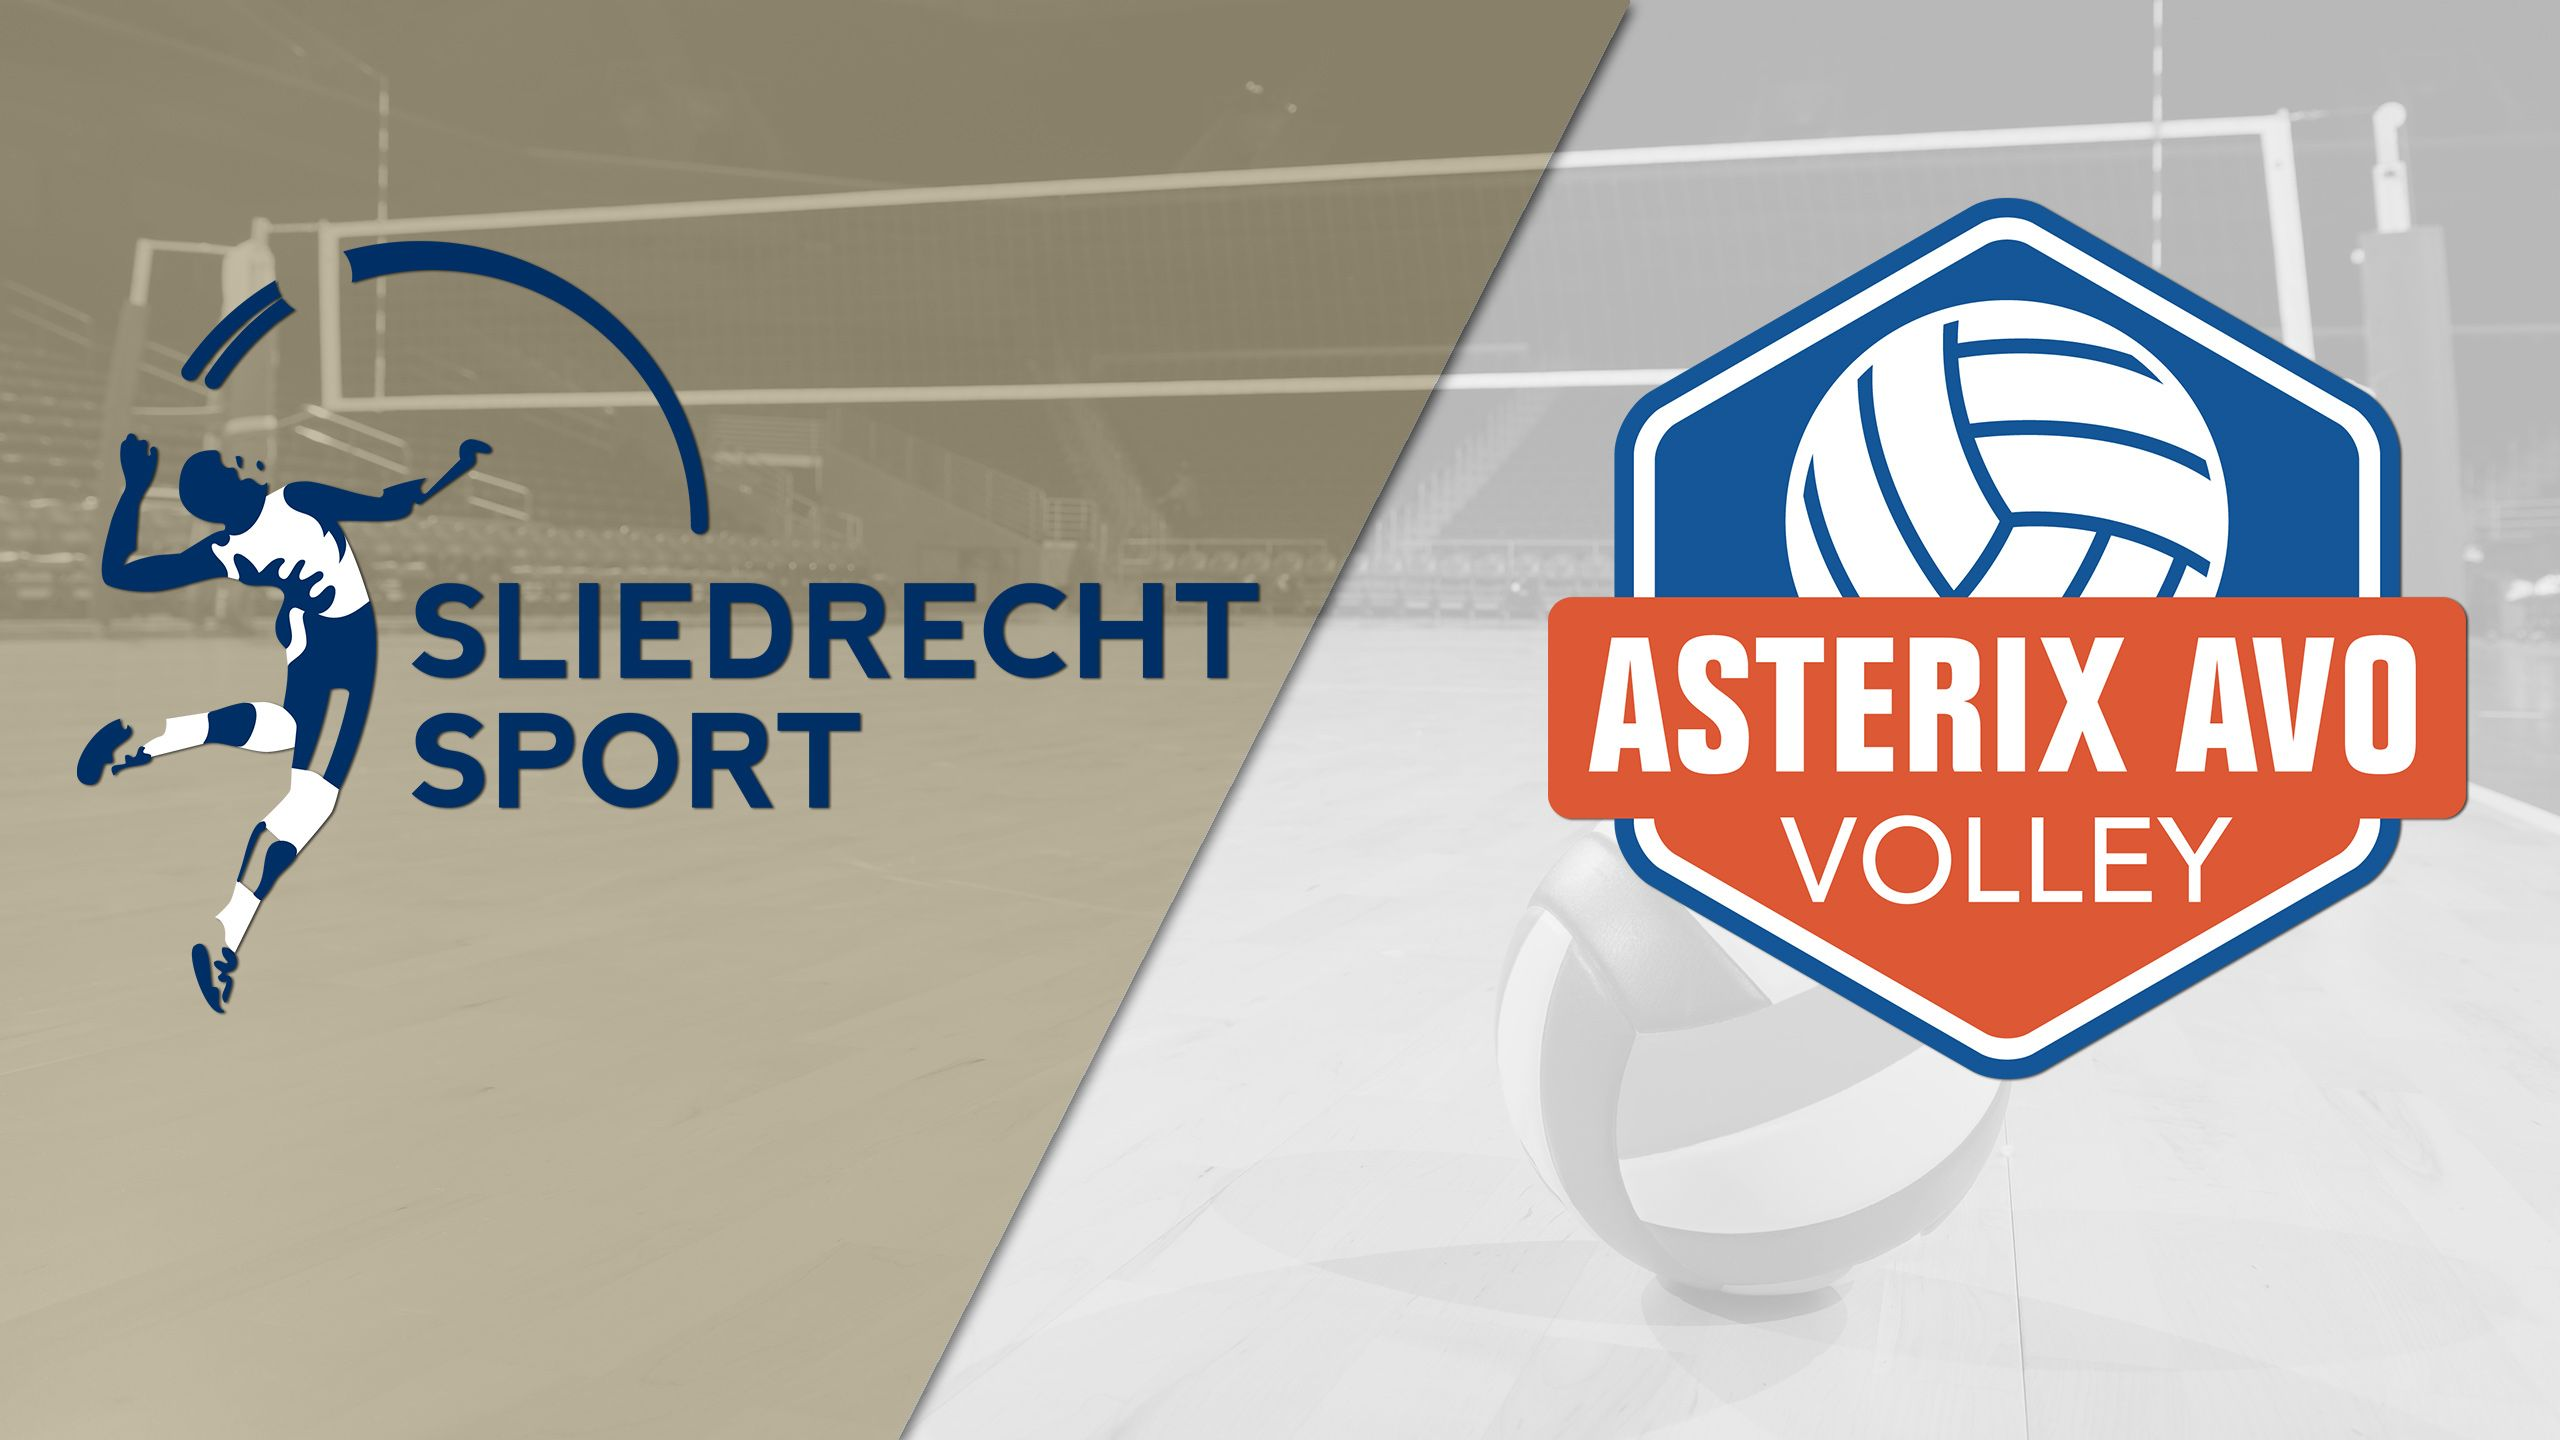 Sliedrecht Sport vs. Asterix Avo Beveren (CEV Women's Champions League)